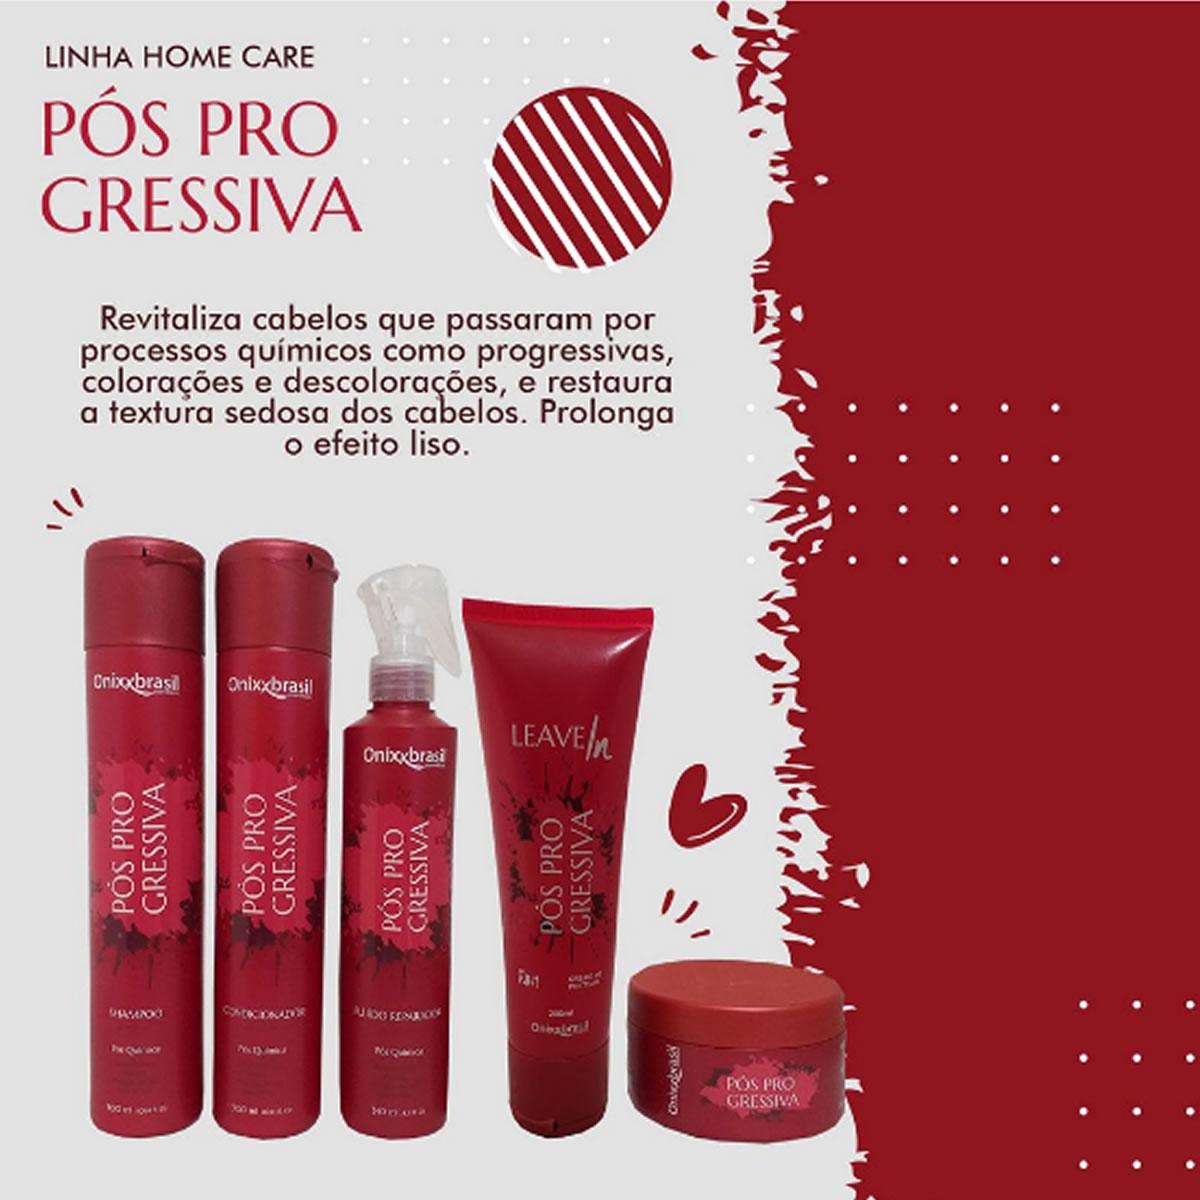 Shampoo Pós Progressiva 300ml - Onixxbrasil